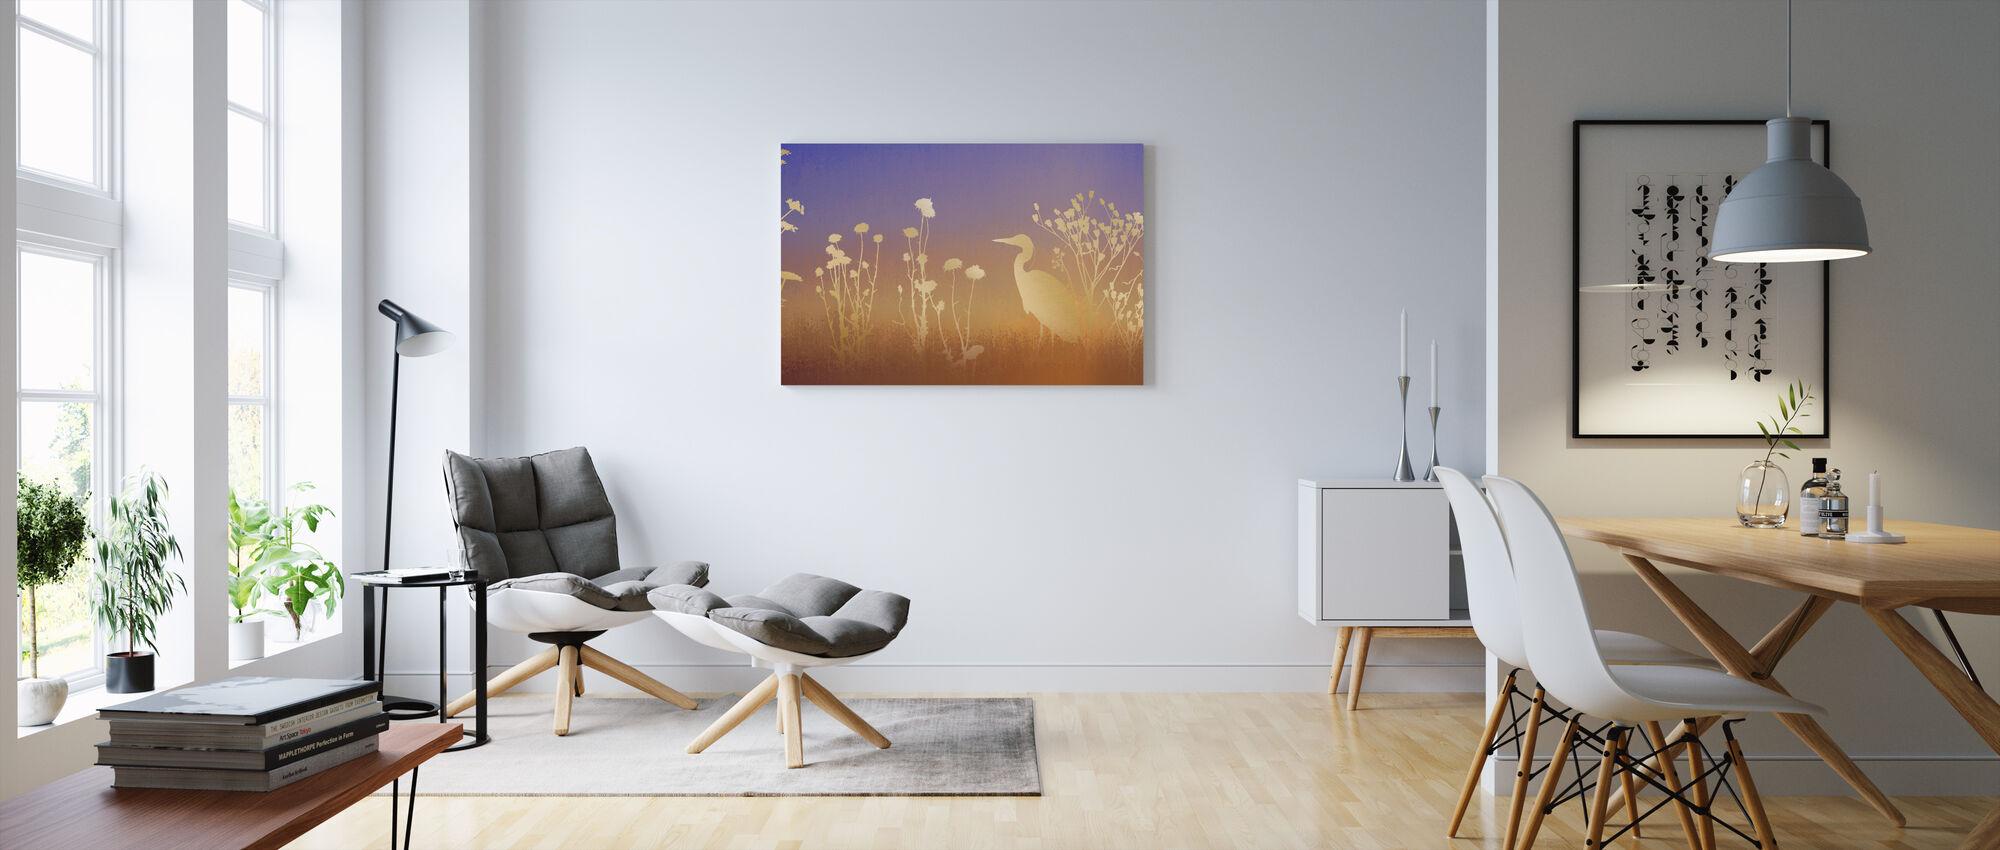 Dawn Silhouetten - Canvas print - Woonkamer